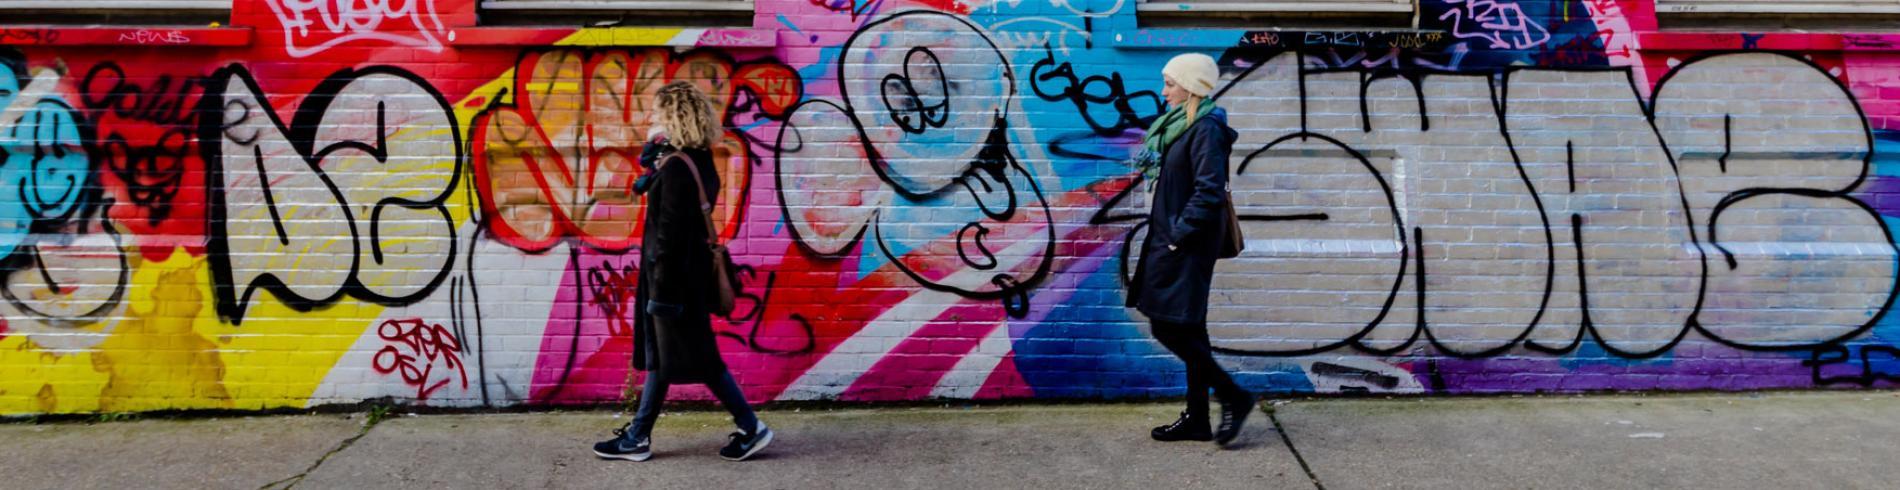 Two women walking past a graffiti covered wall